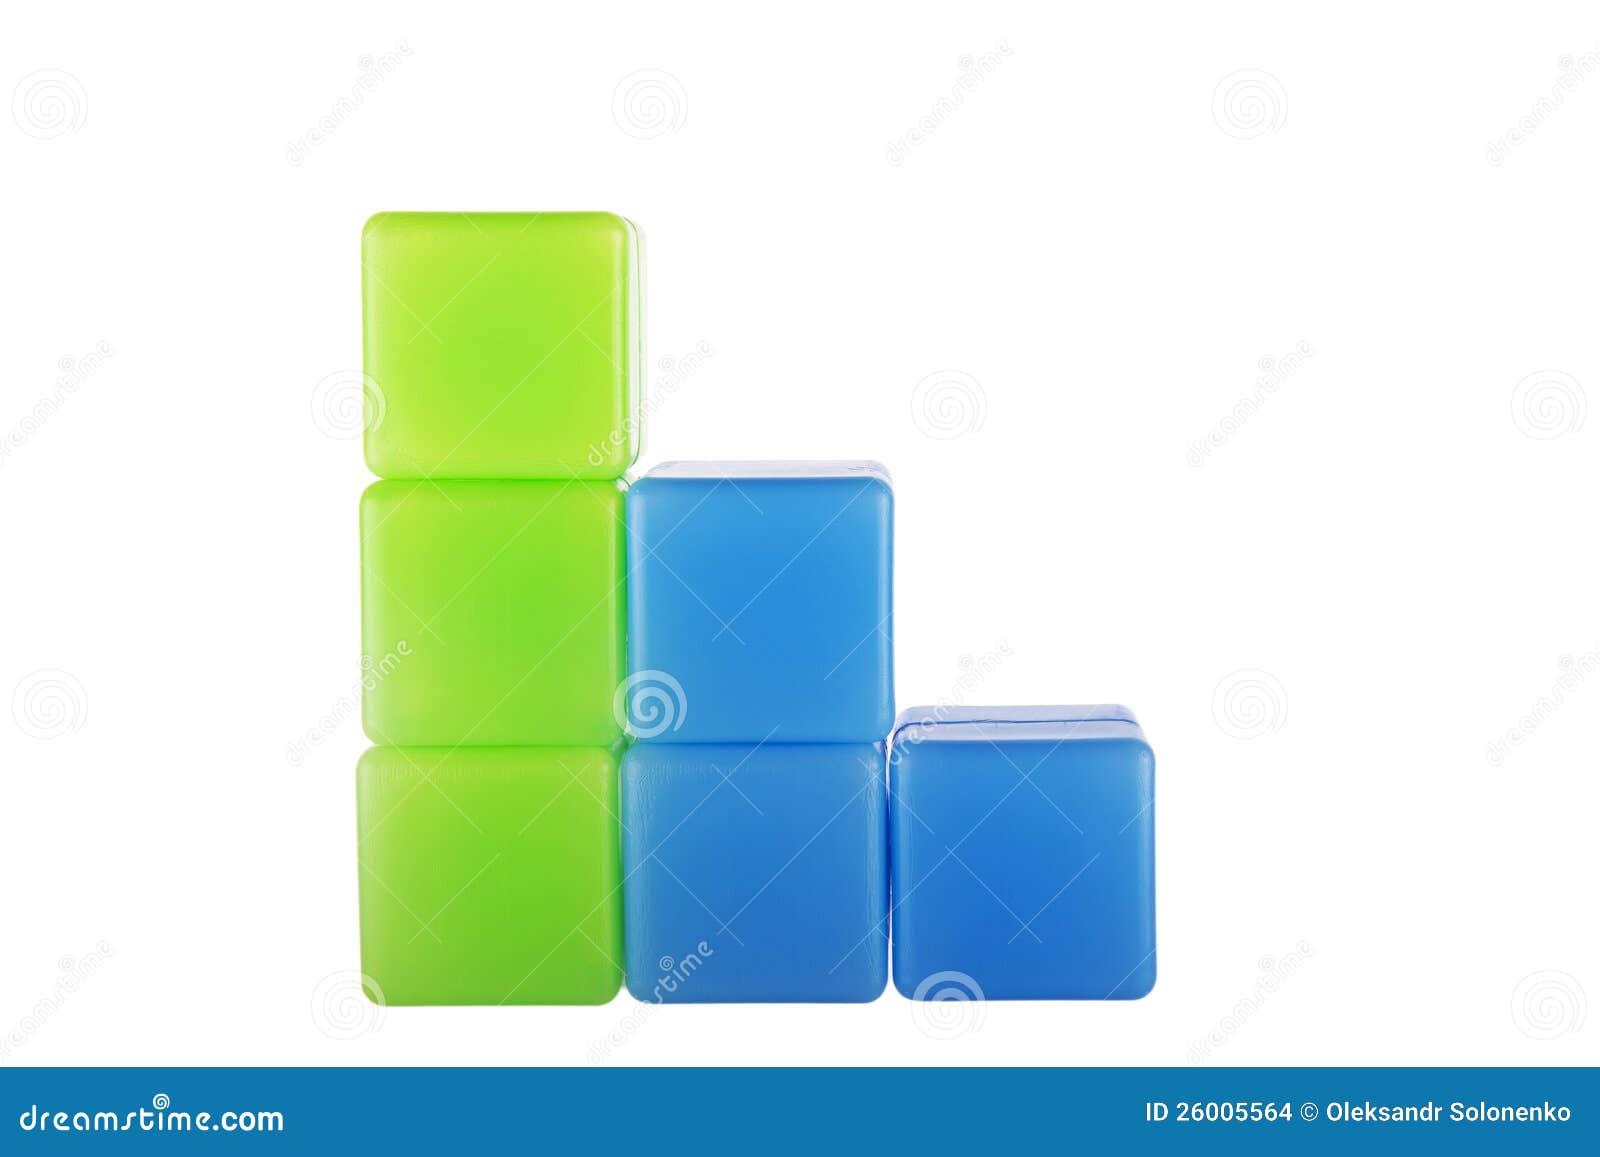 Diagram Made Of Plastic Building Blocks Stock Images